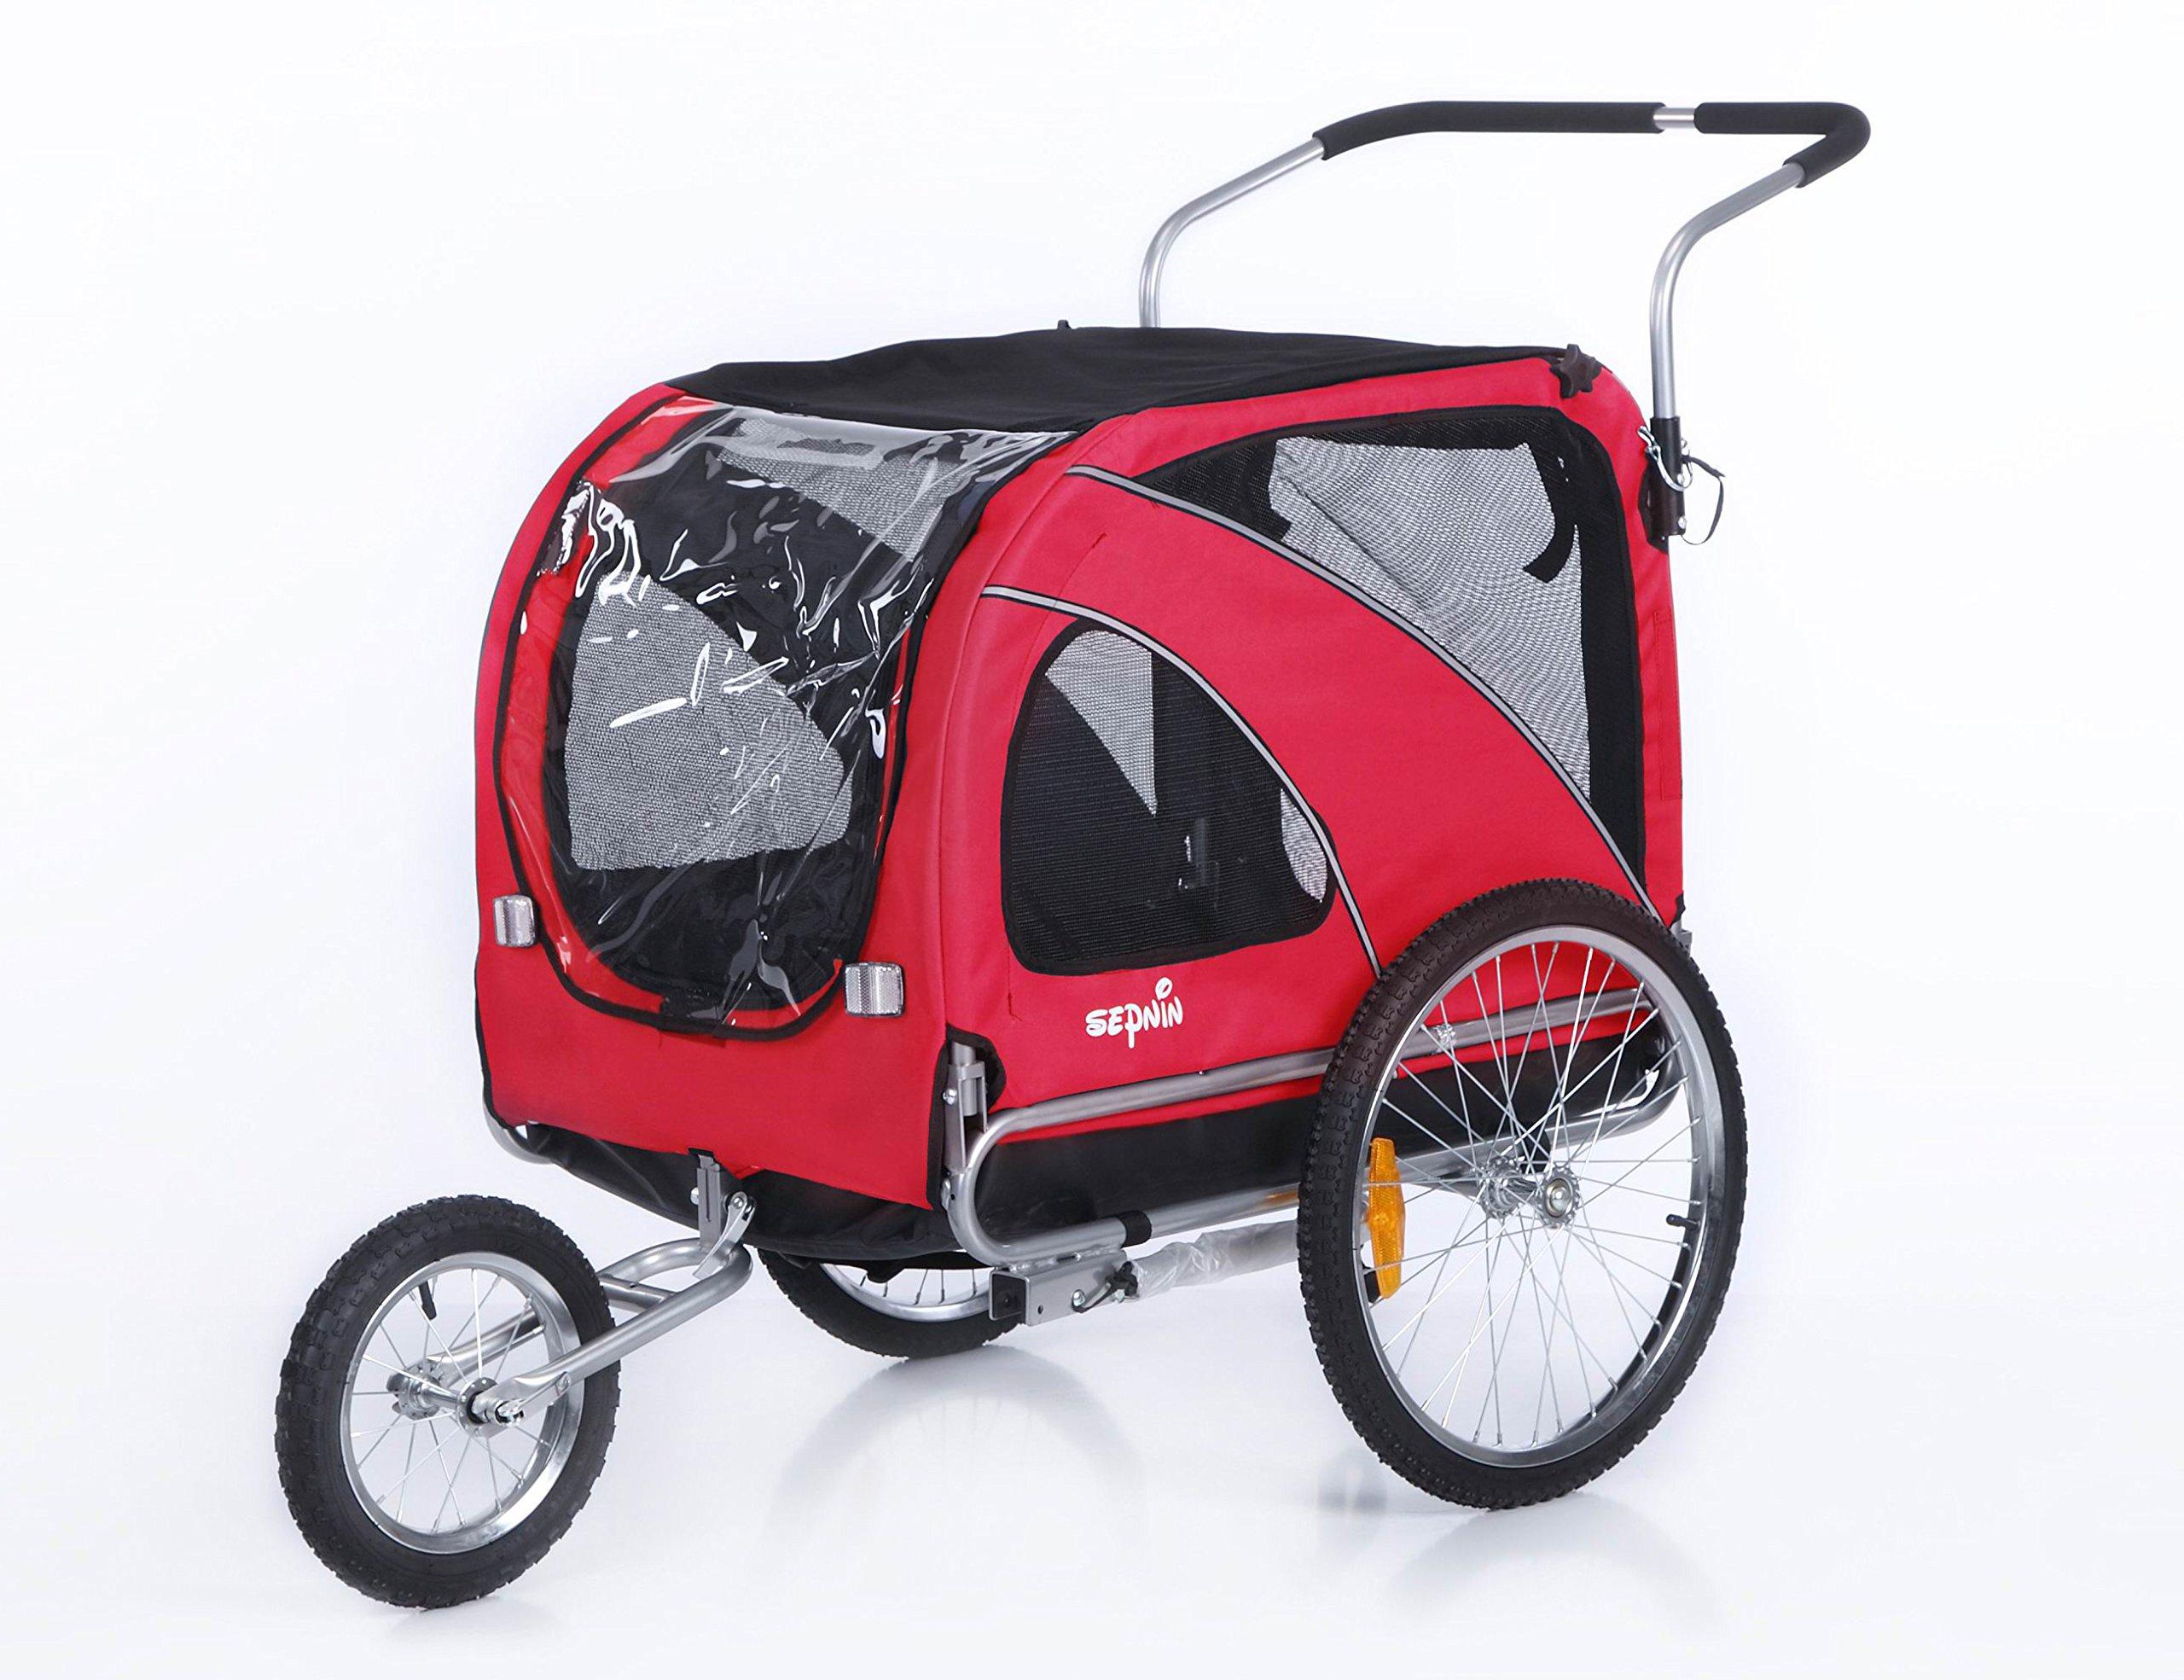 Sepnine 2 in1 large pet dog bike trailer bicycle trailer and stroller jogger 10202 (Red)